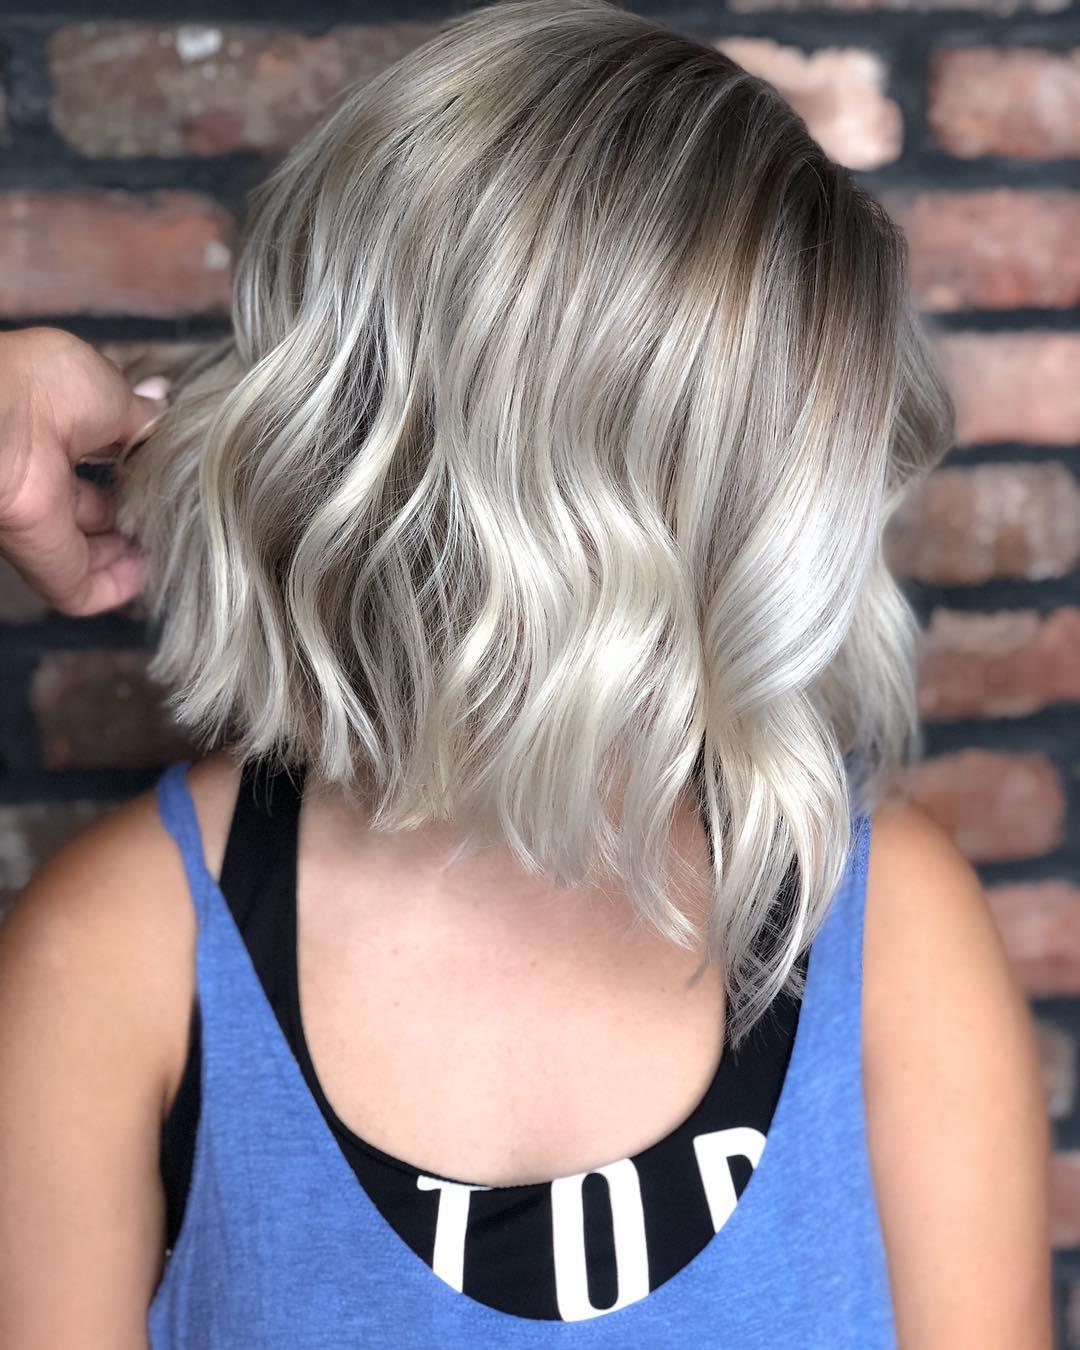 Окрашивание волос зима 2019-2020 фото 12